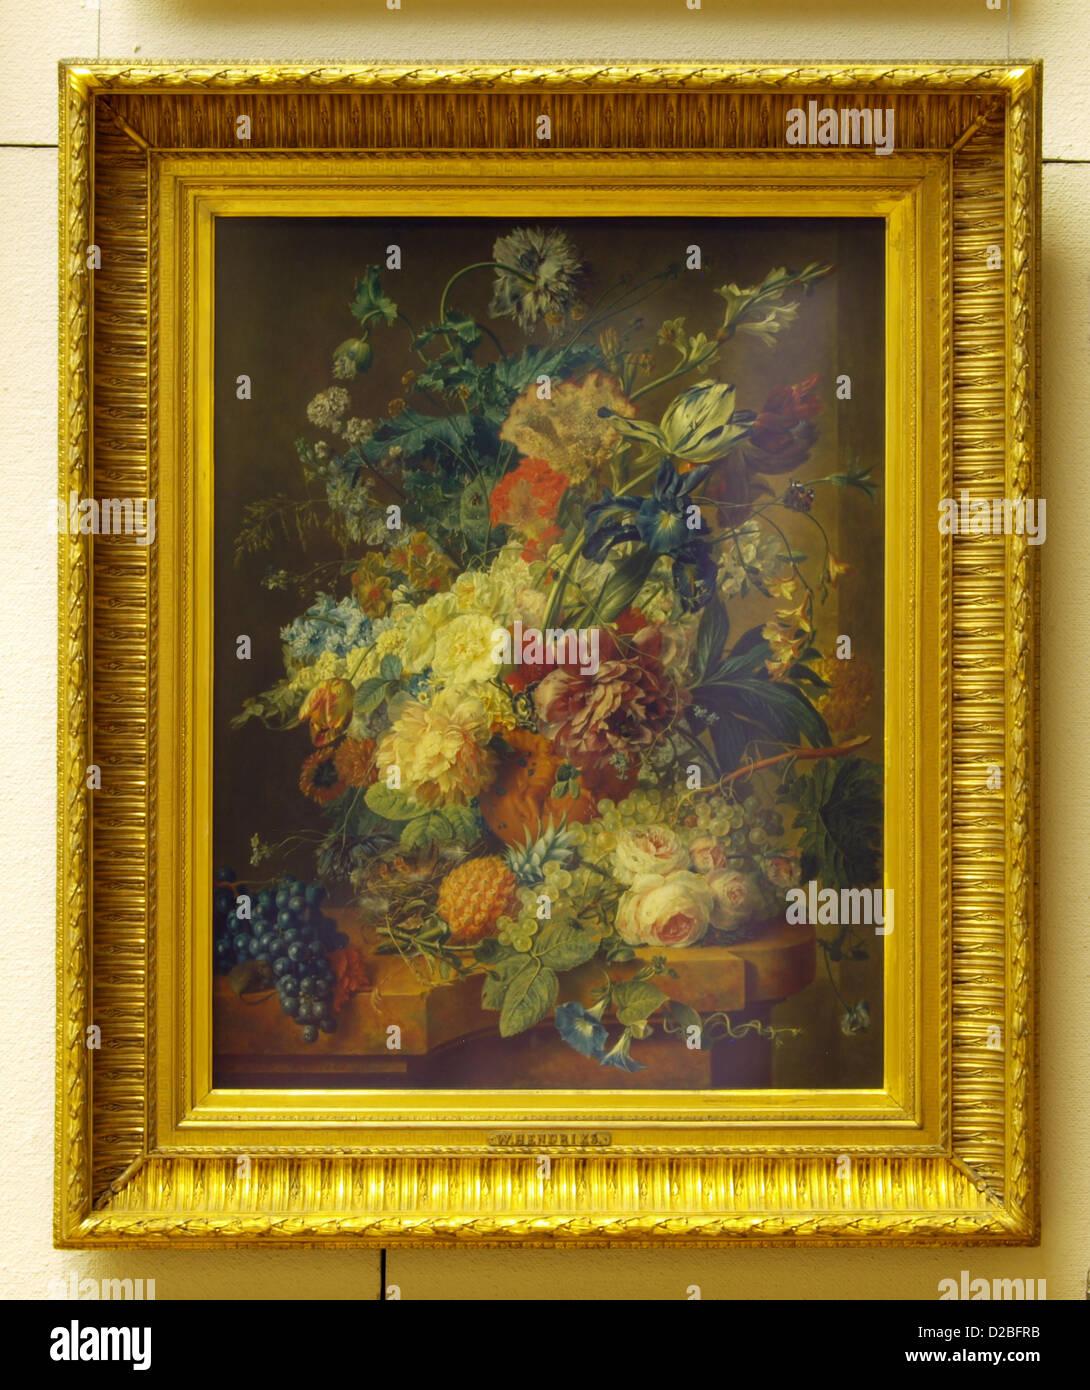 Wybrand Hendriks (1744-1831), Floral Still Life, olio su pannello Immagini Stock